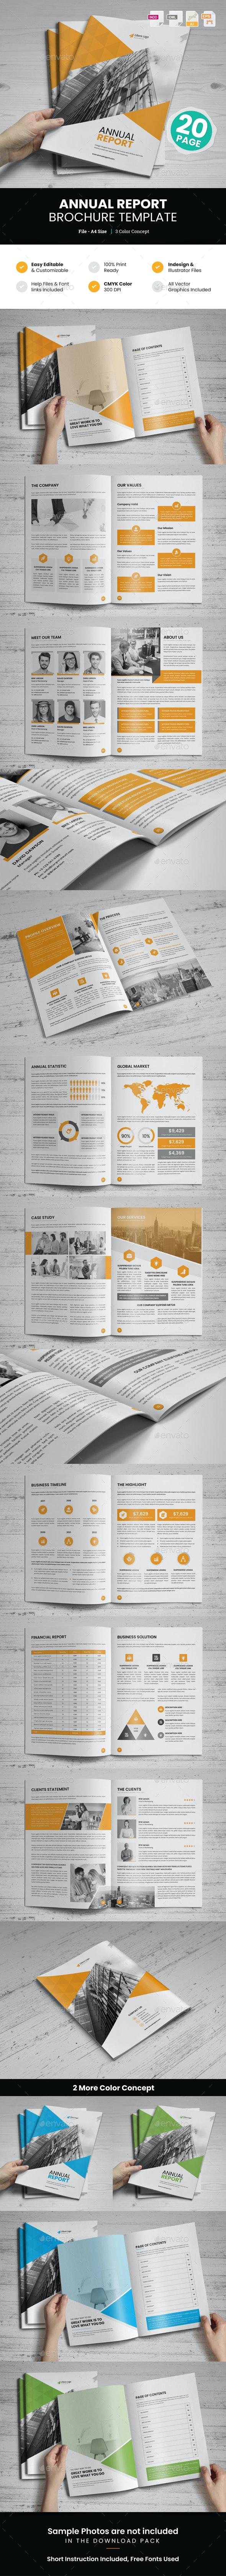 Annual Report Design v5 - Corporate Brochures